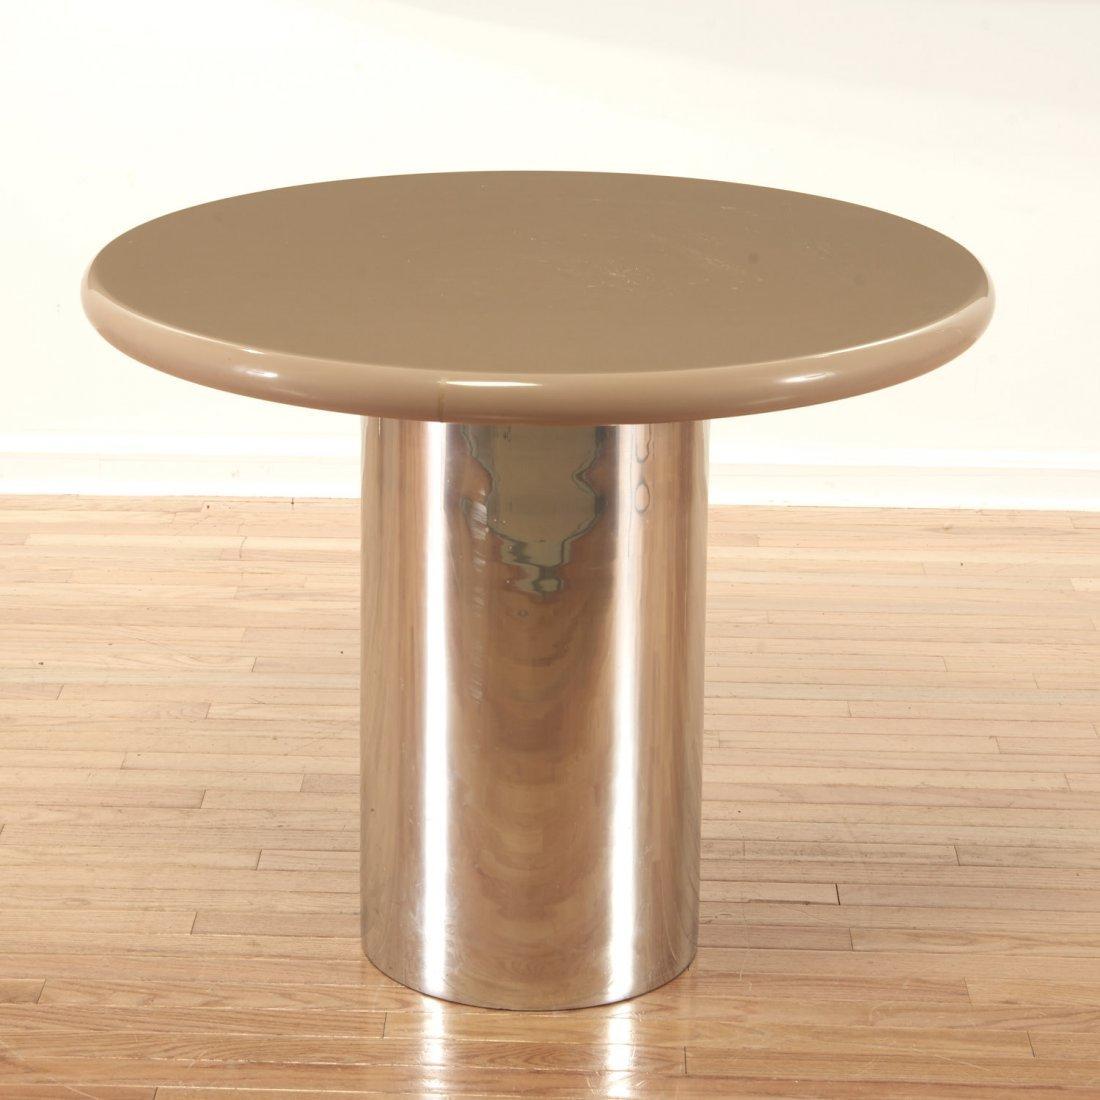 Karl Springer style chrome, acrylic dining table - 2